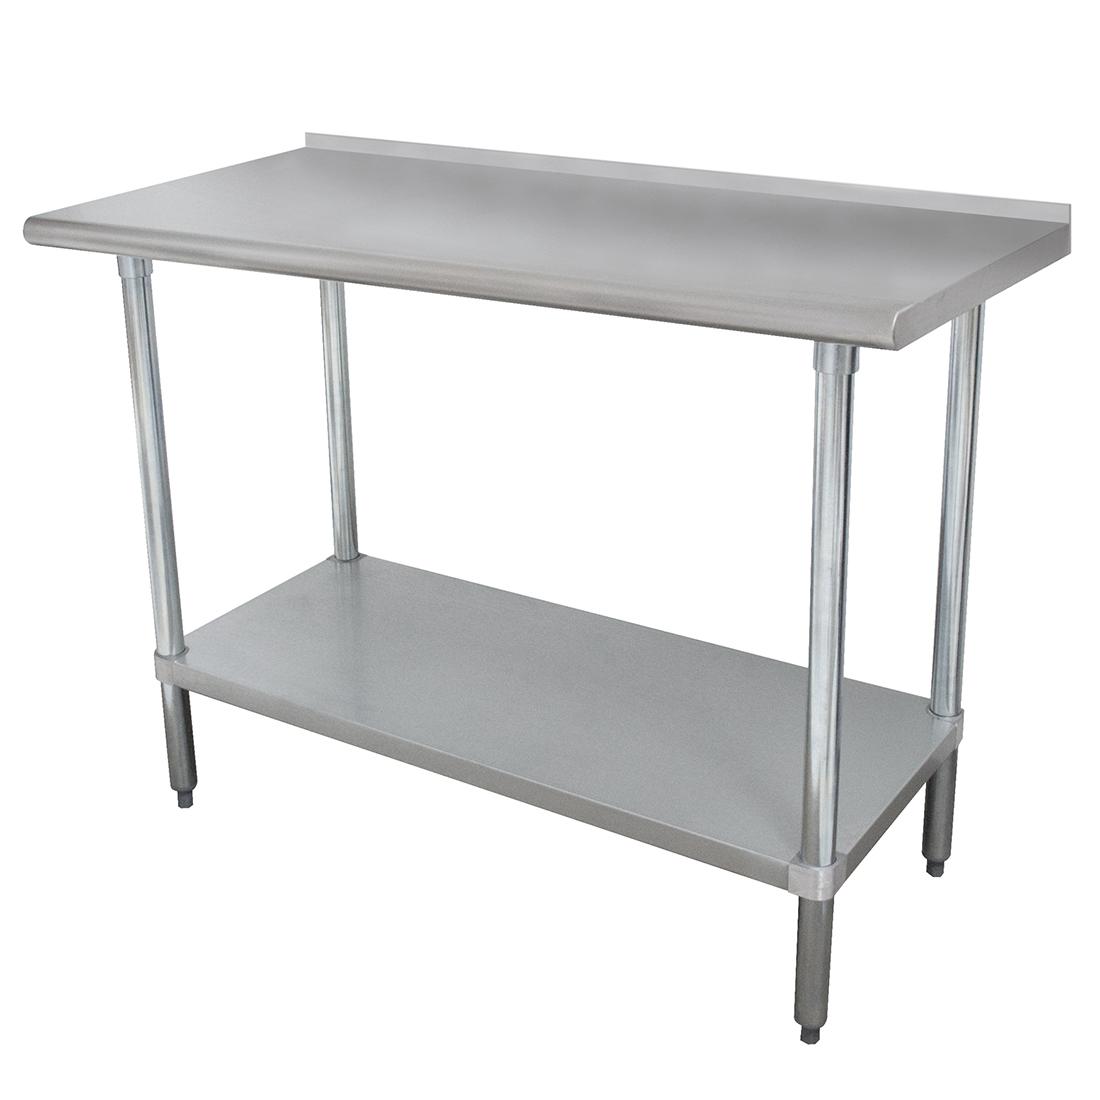 Advance Tabco FLG-240 work table,  30